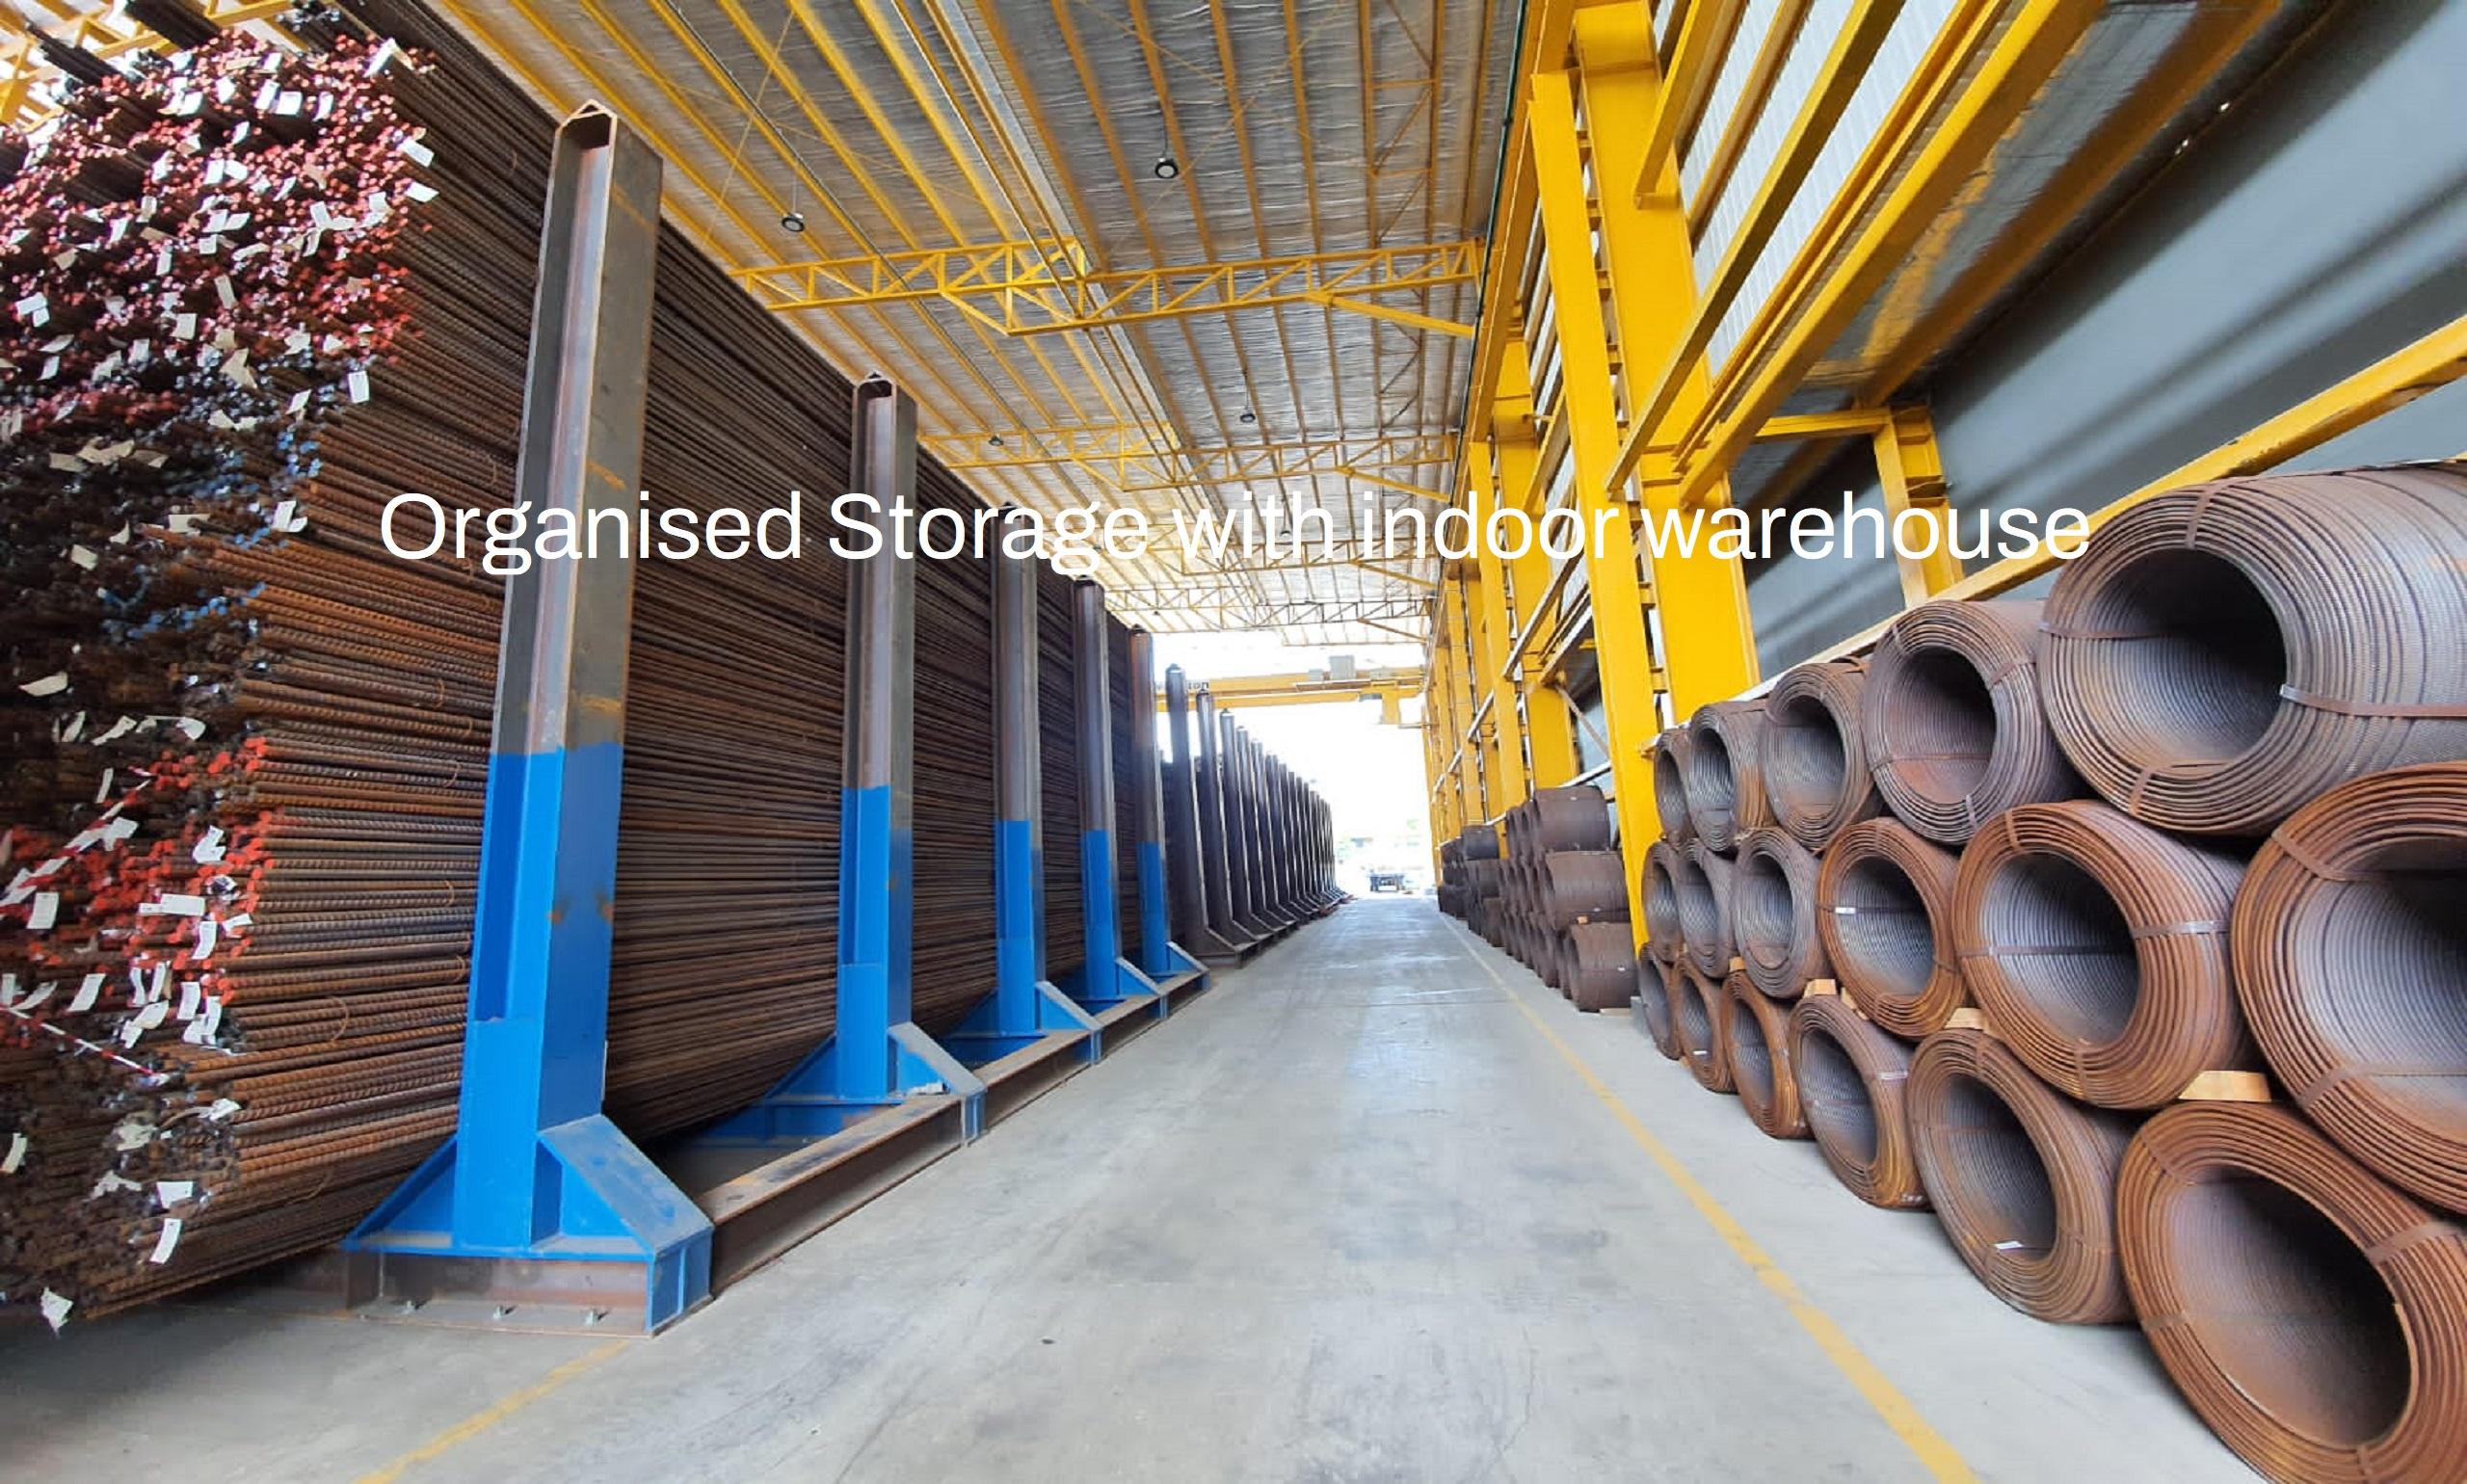 Organised Storage with indoor warehouse